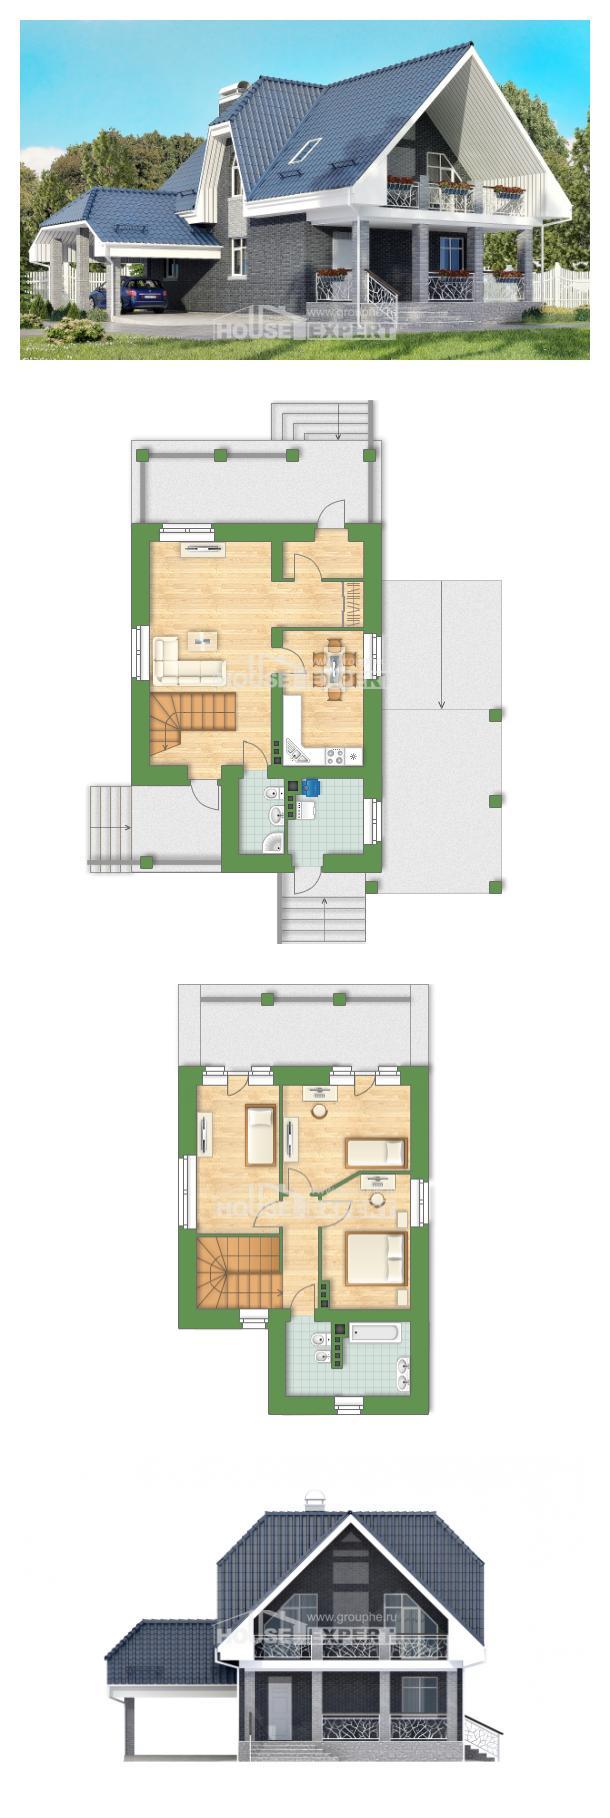 Ev villa projesi 125-002-L | House Expert